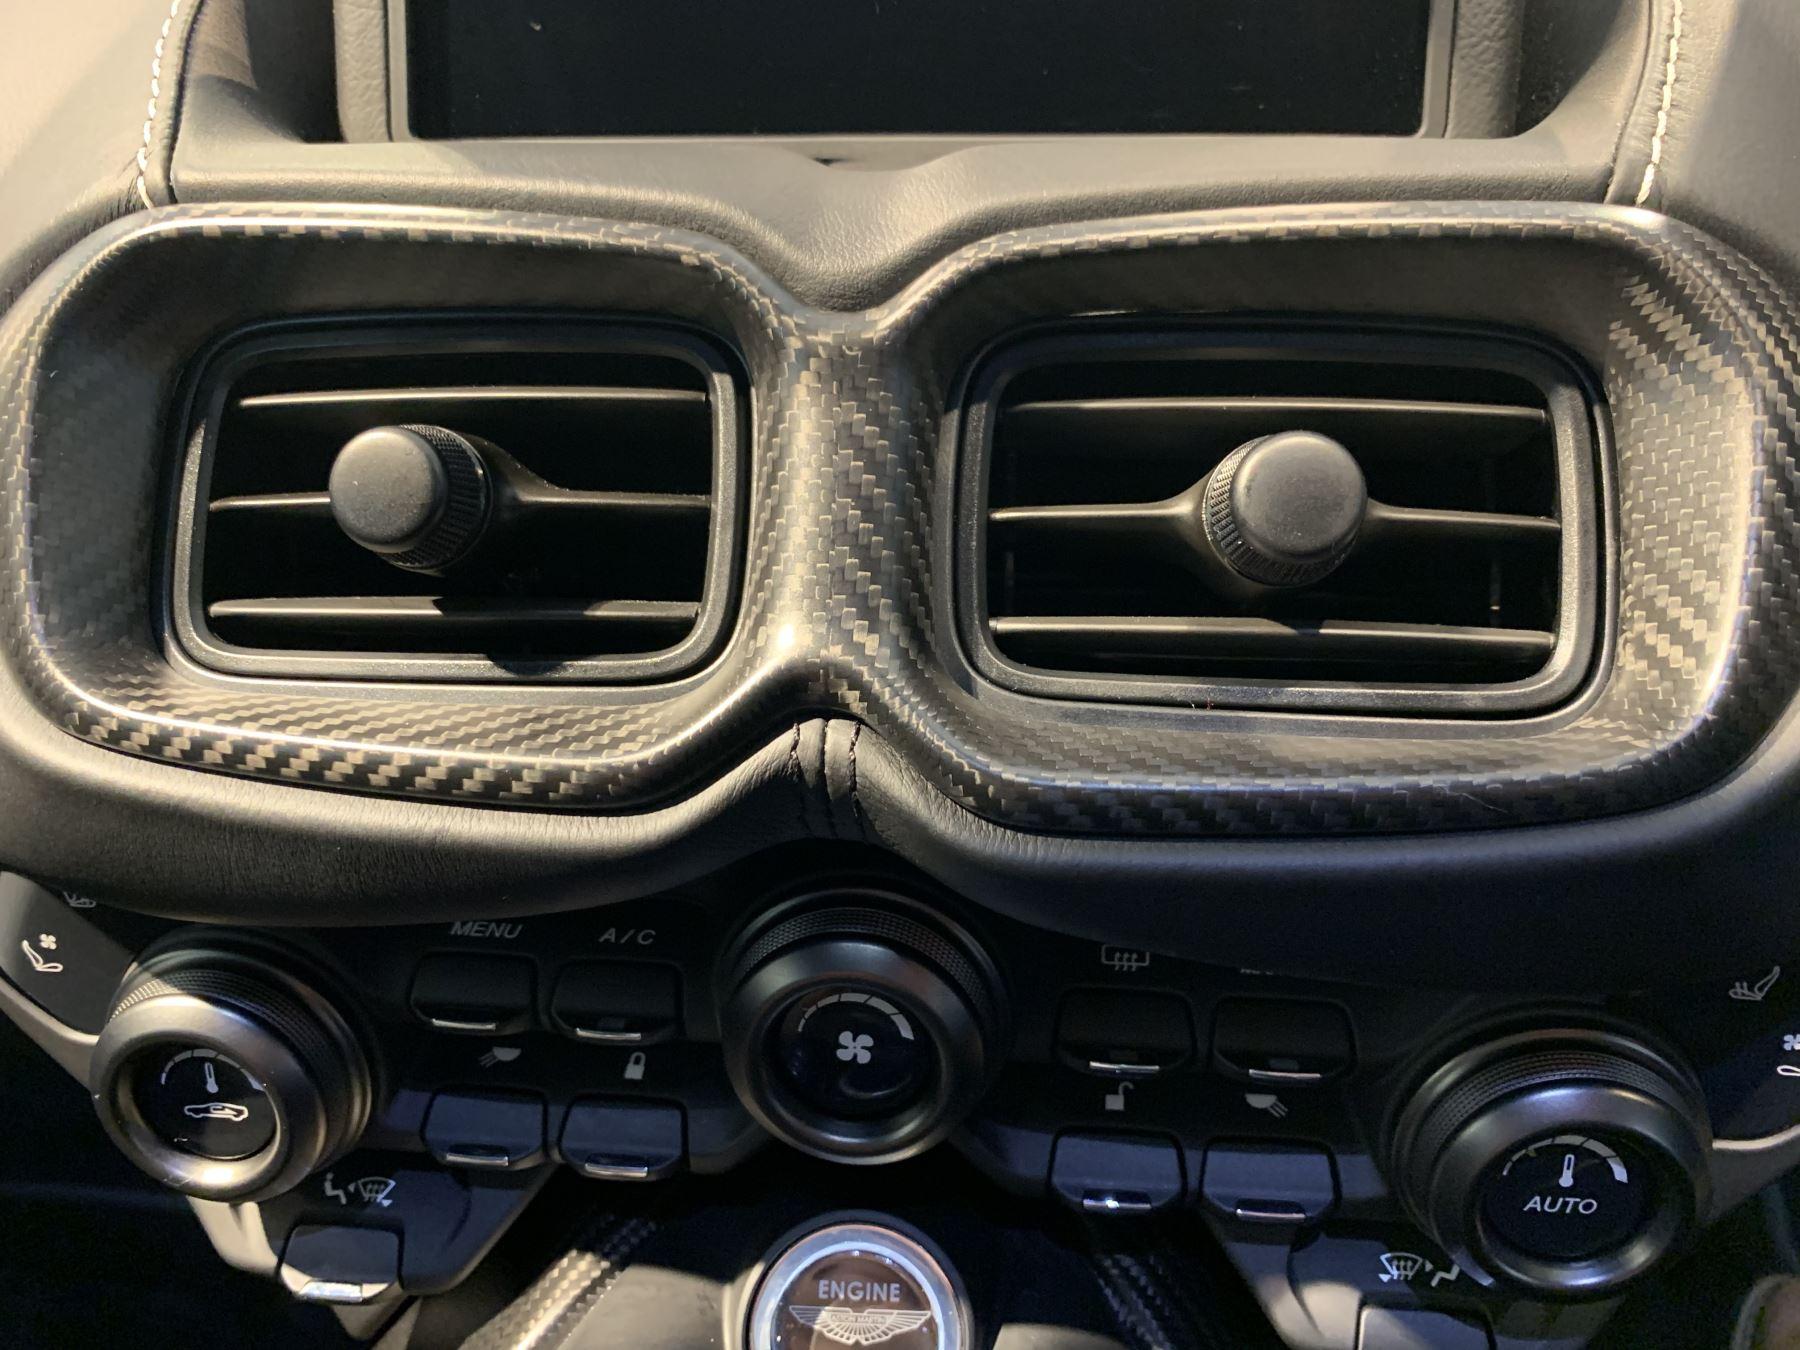 Aston Martin New Vantage 2dr ZF 8 Speed image 28